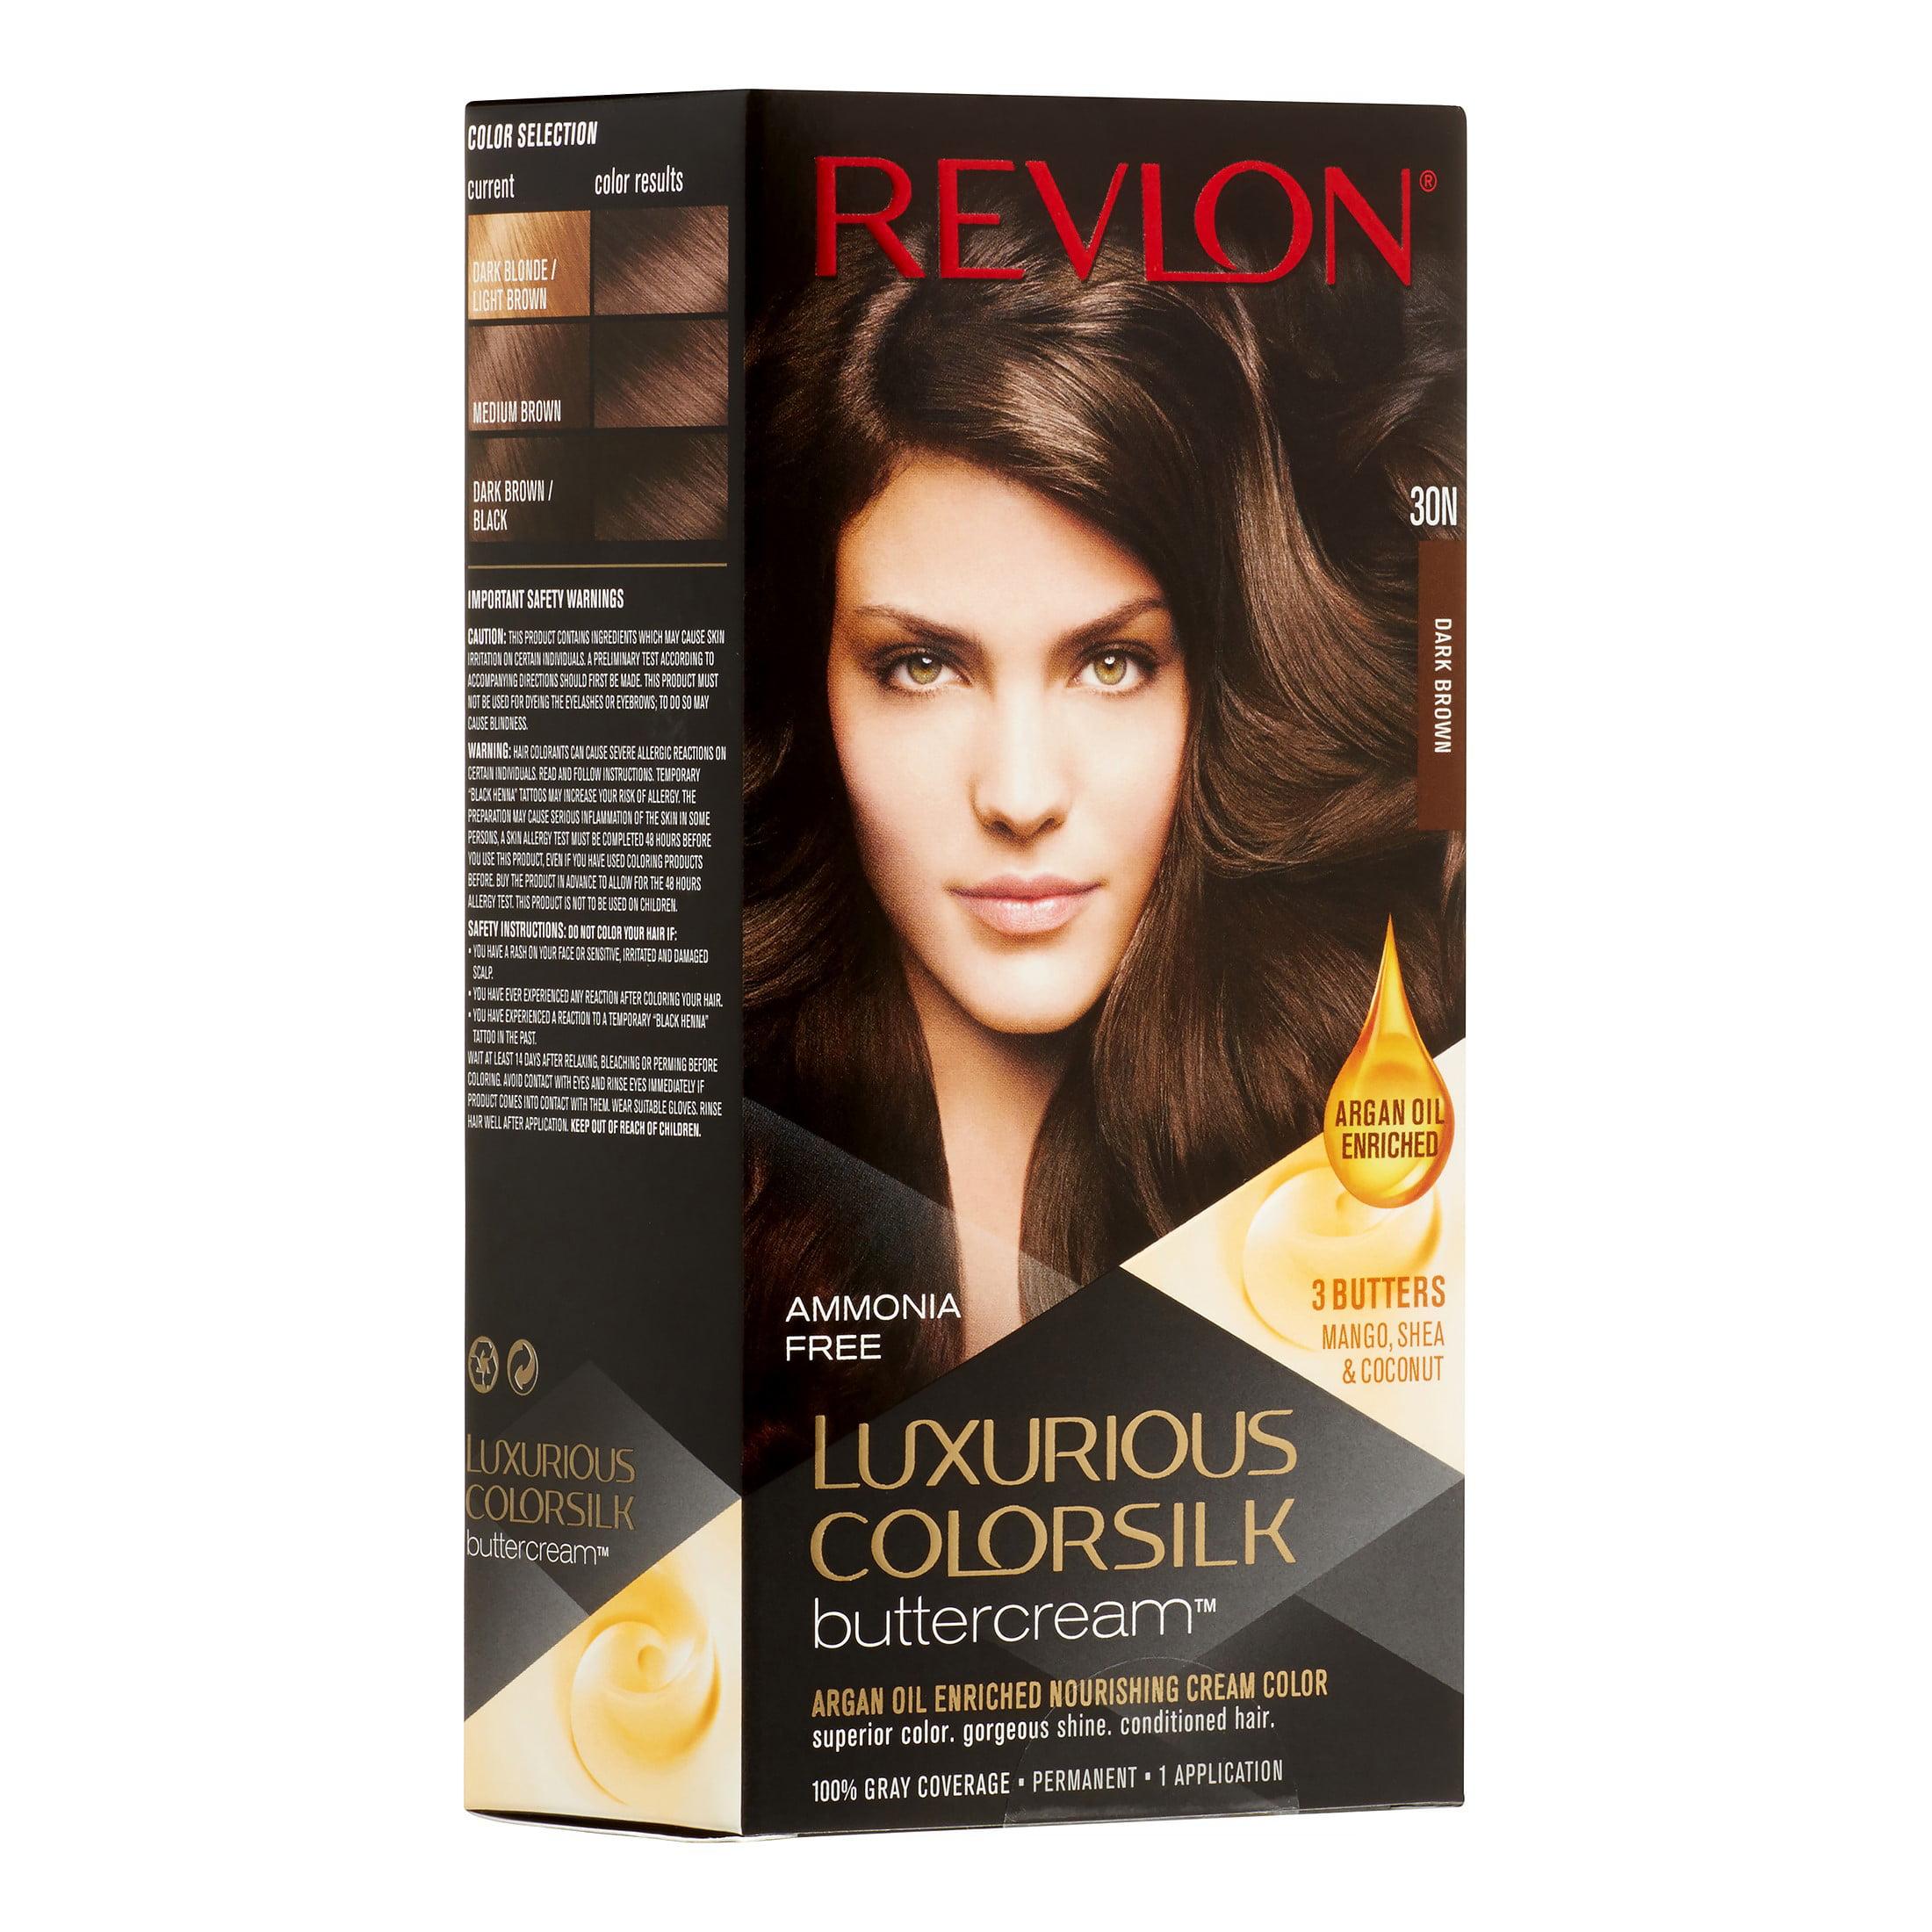 Revlon Colorsilk Buttercream Hair Color 53 Medium Golden Brown